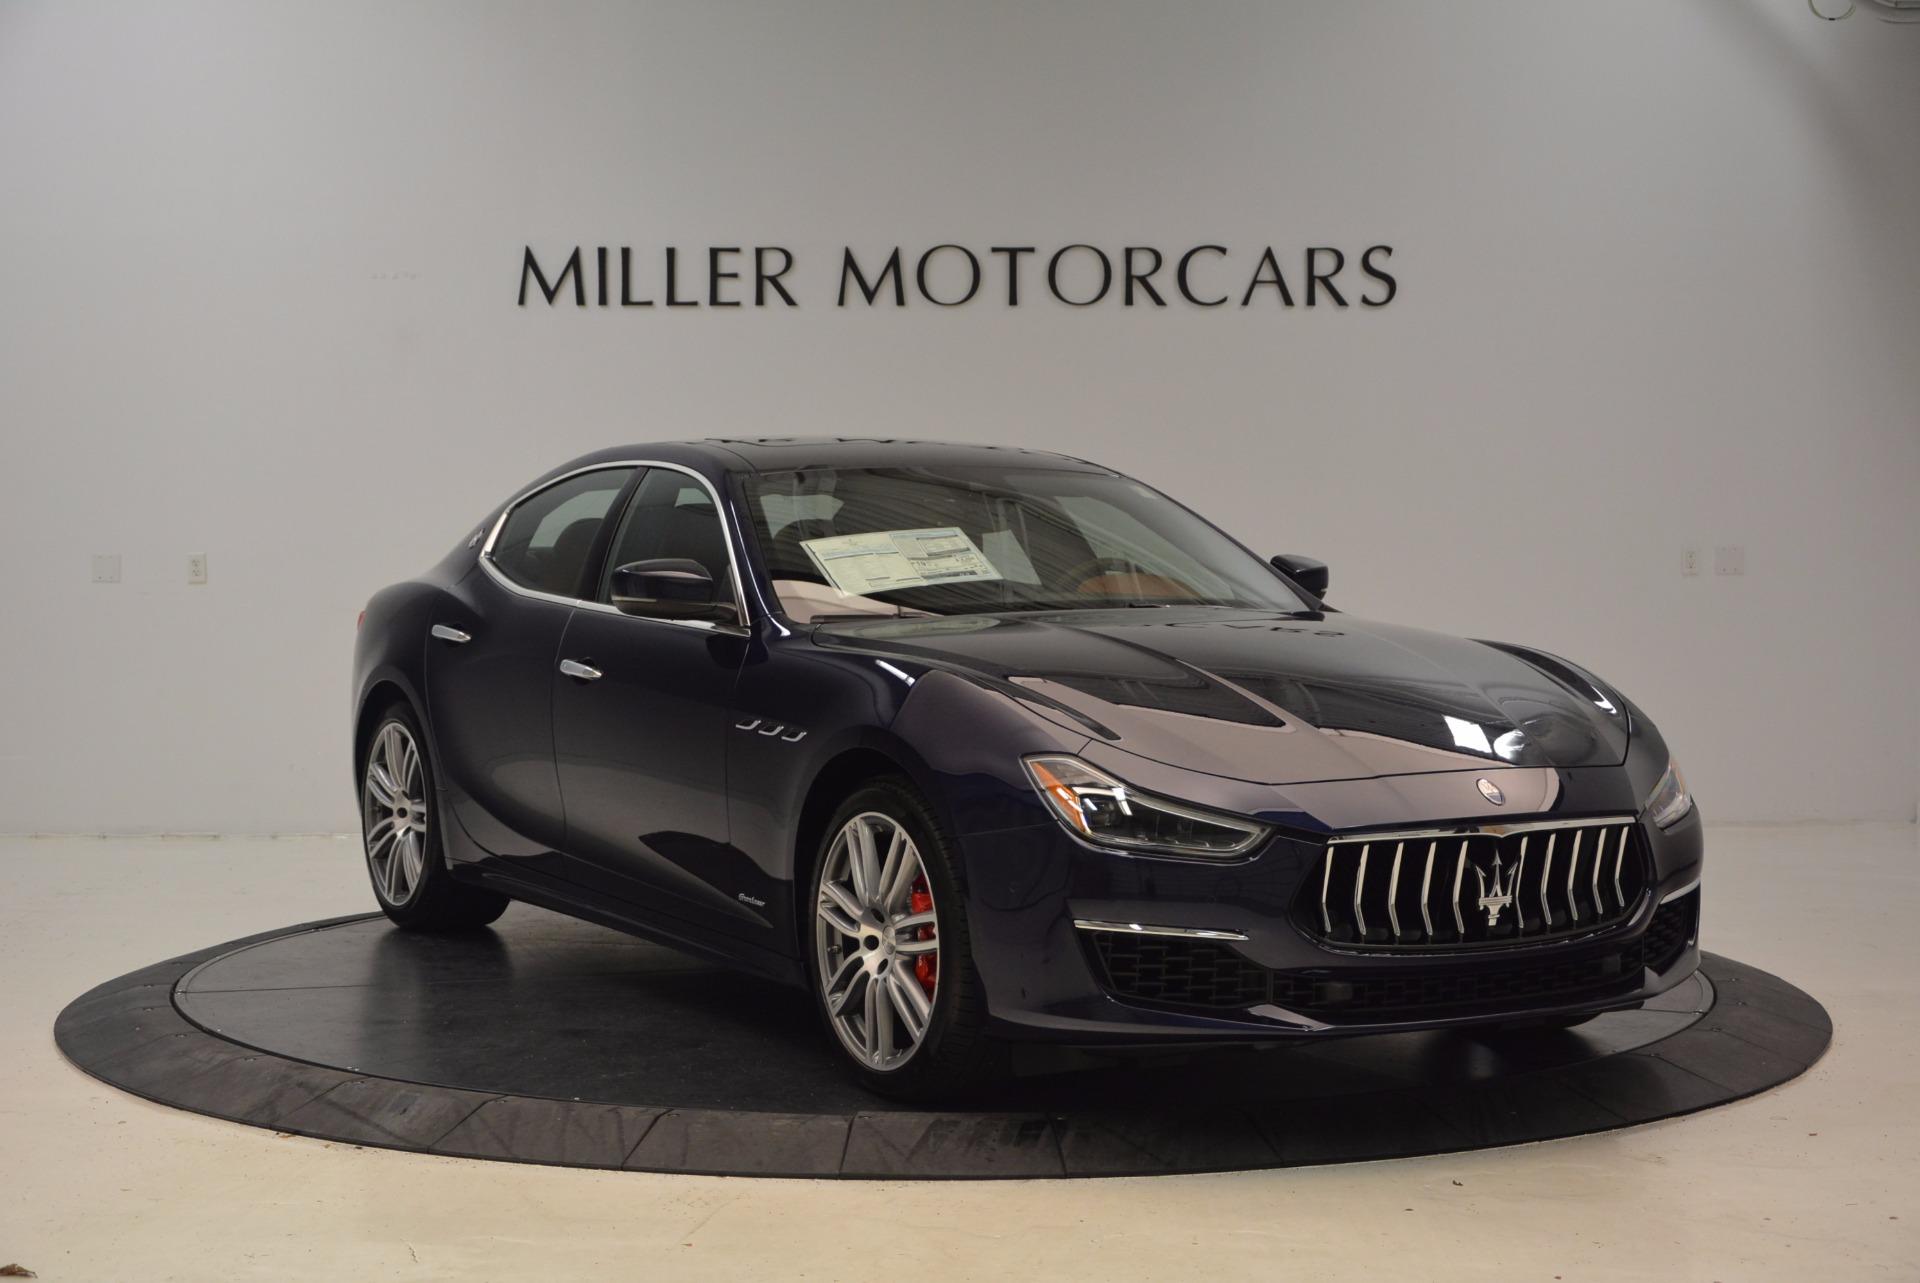 New 2018 Maserati Ghibli S Q4 GranLusso For Sale In Westport, CT 1866_p11